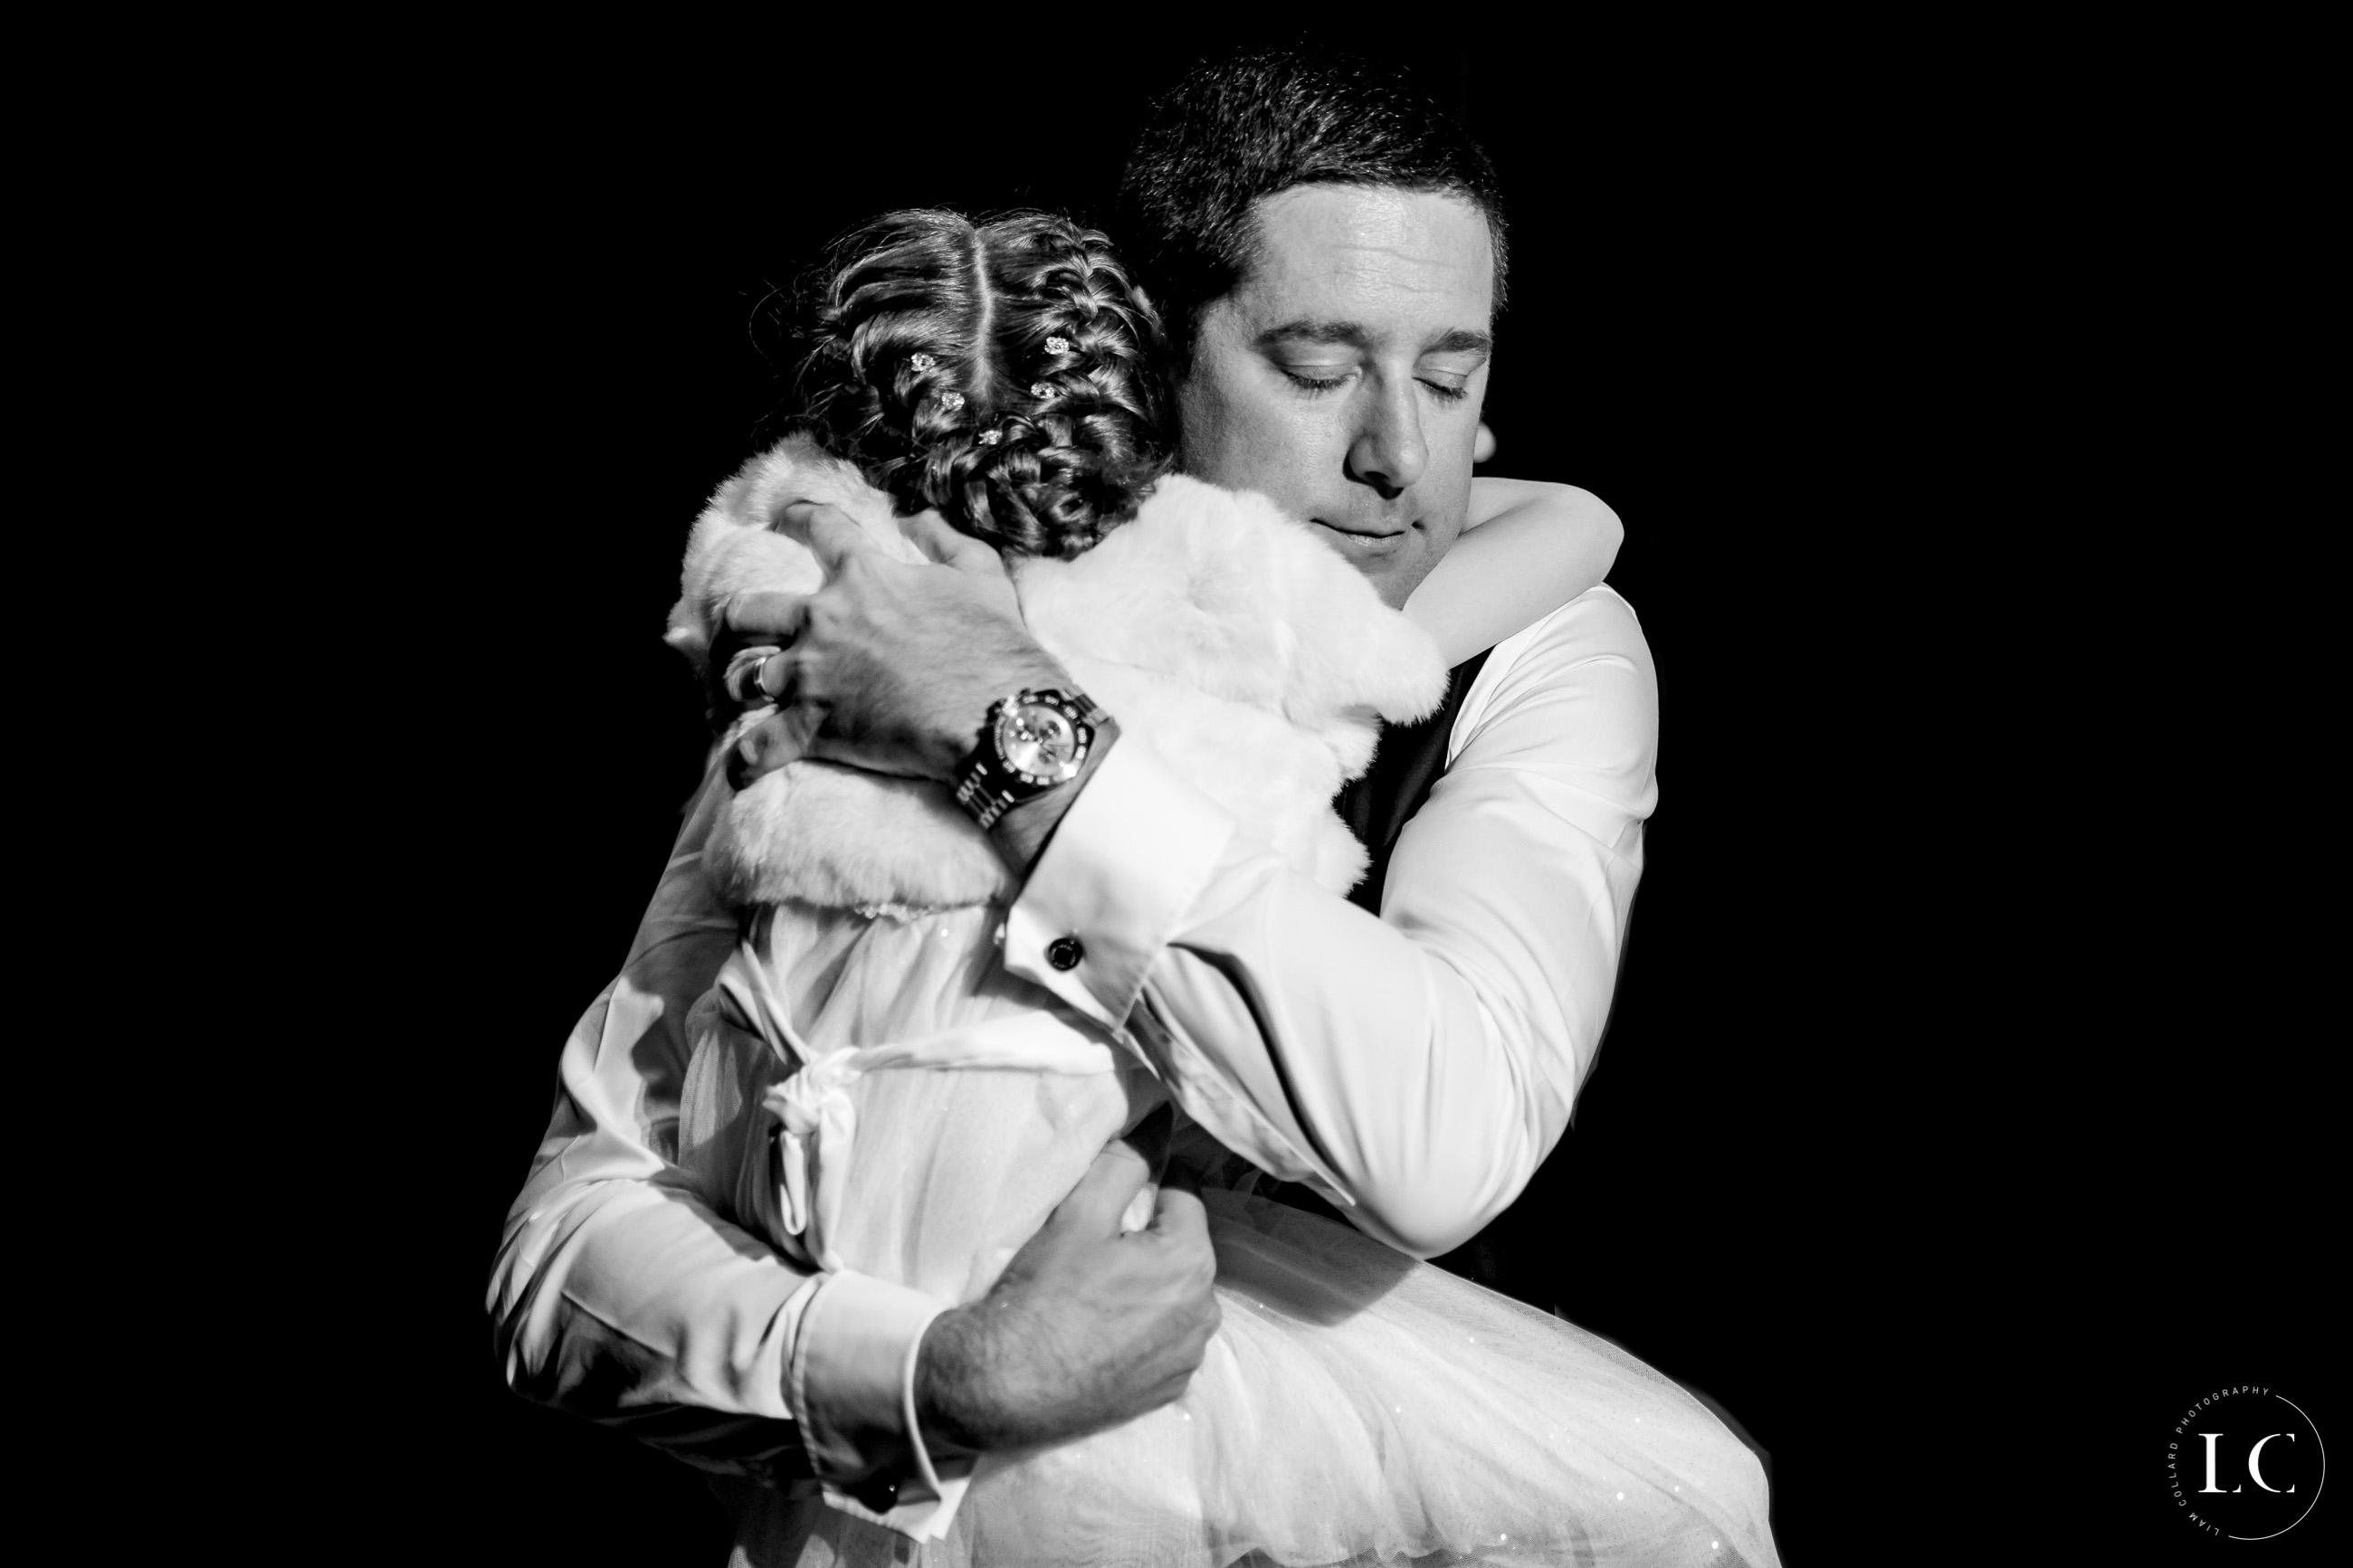 Groom hugging child